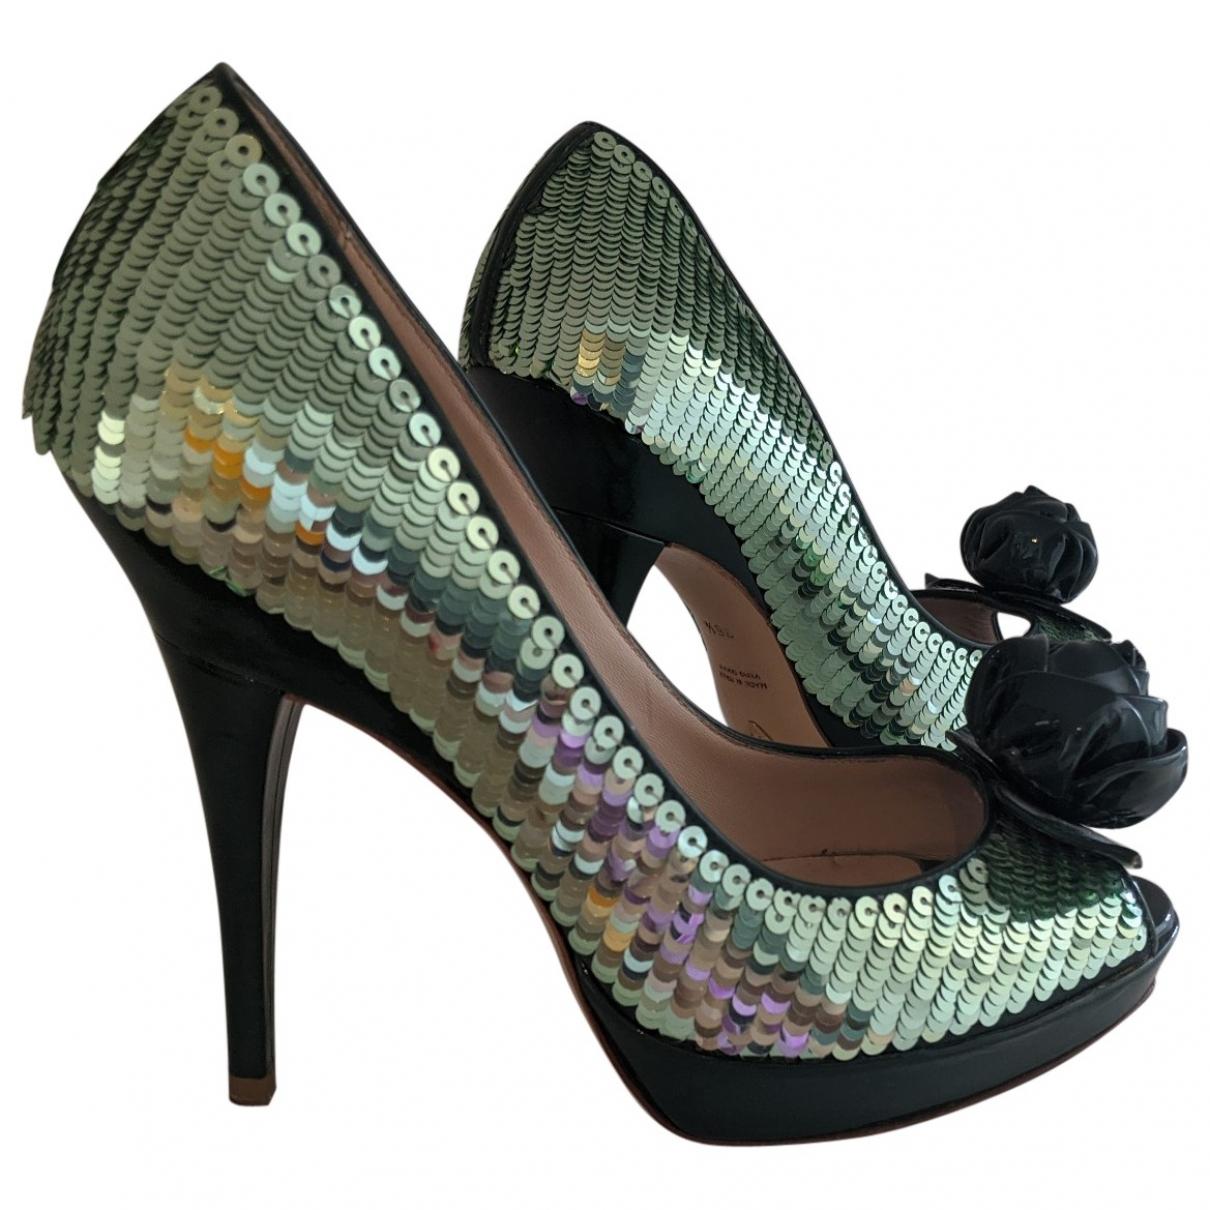 Emporio Armani \N Green Glitter Heels for Women 36.5 EU